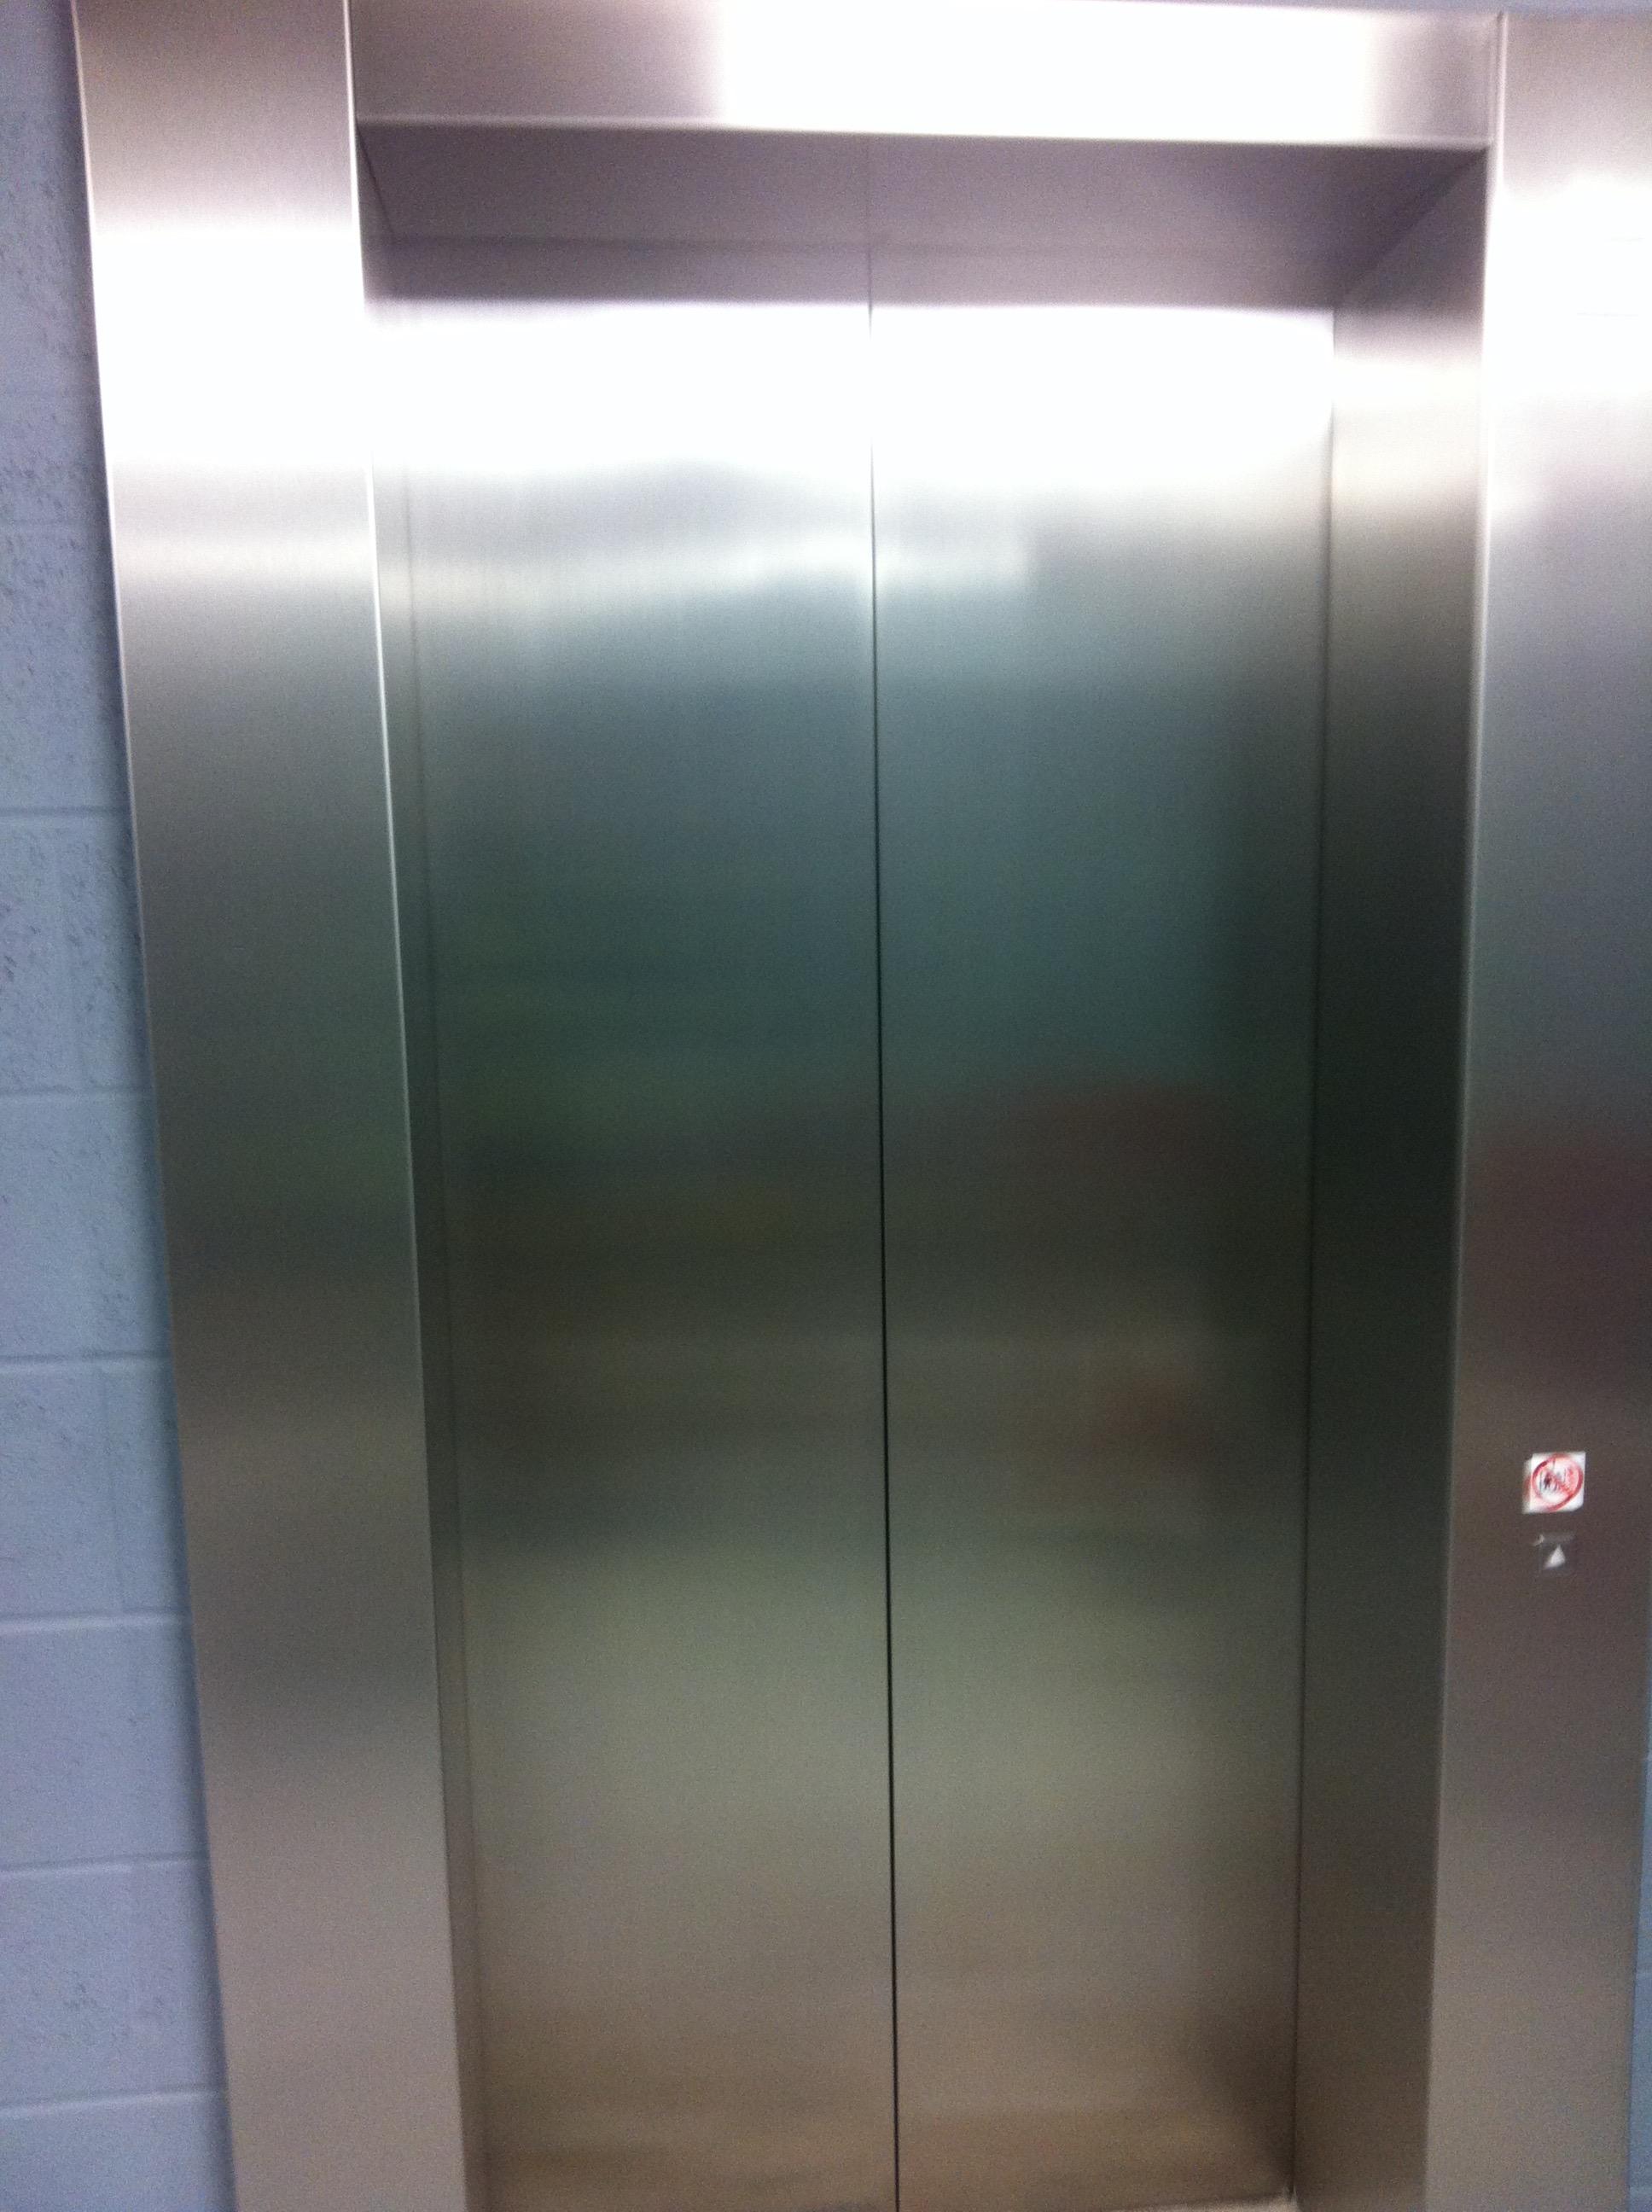 Damaged Lift Doors- After